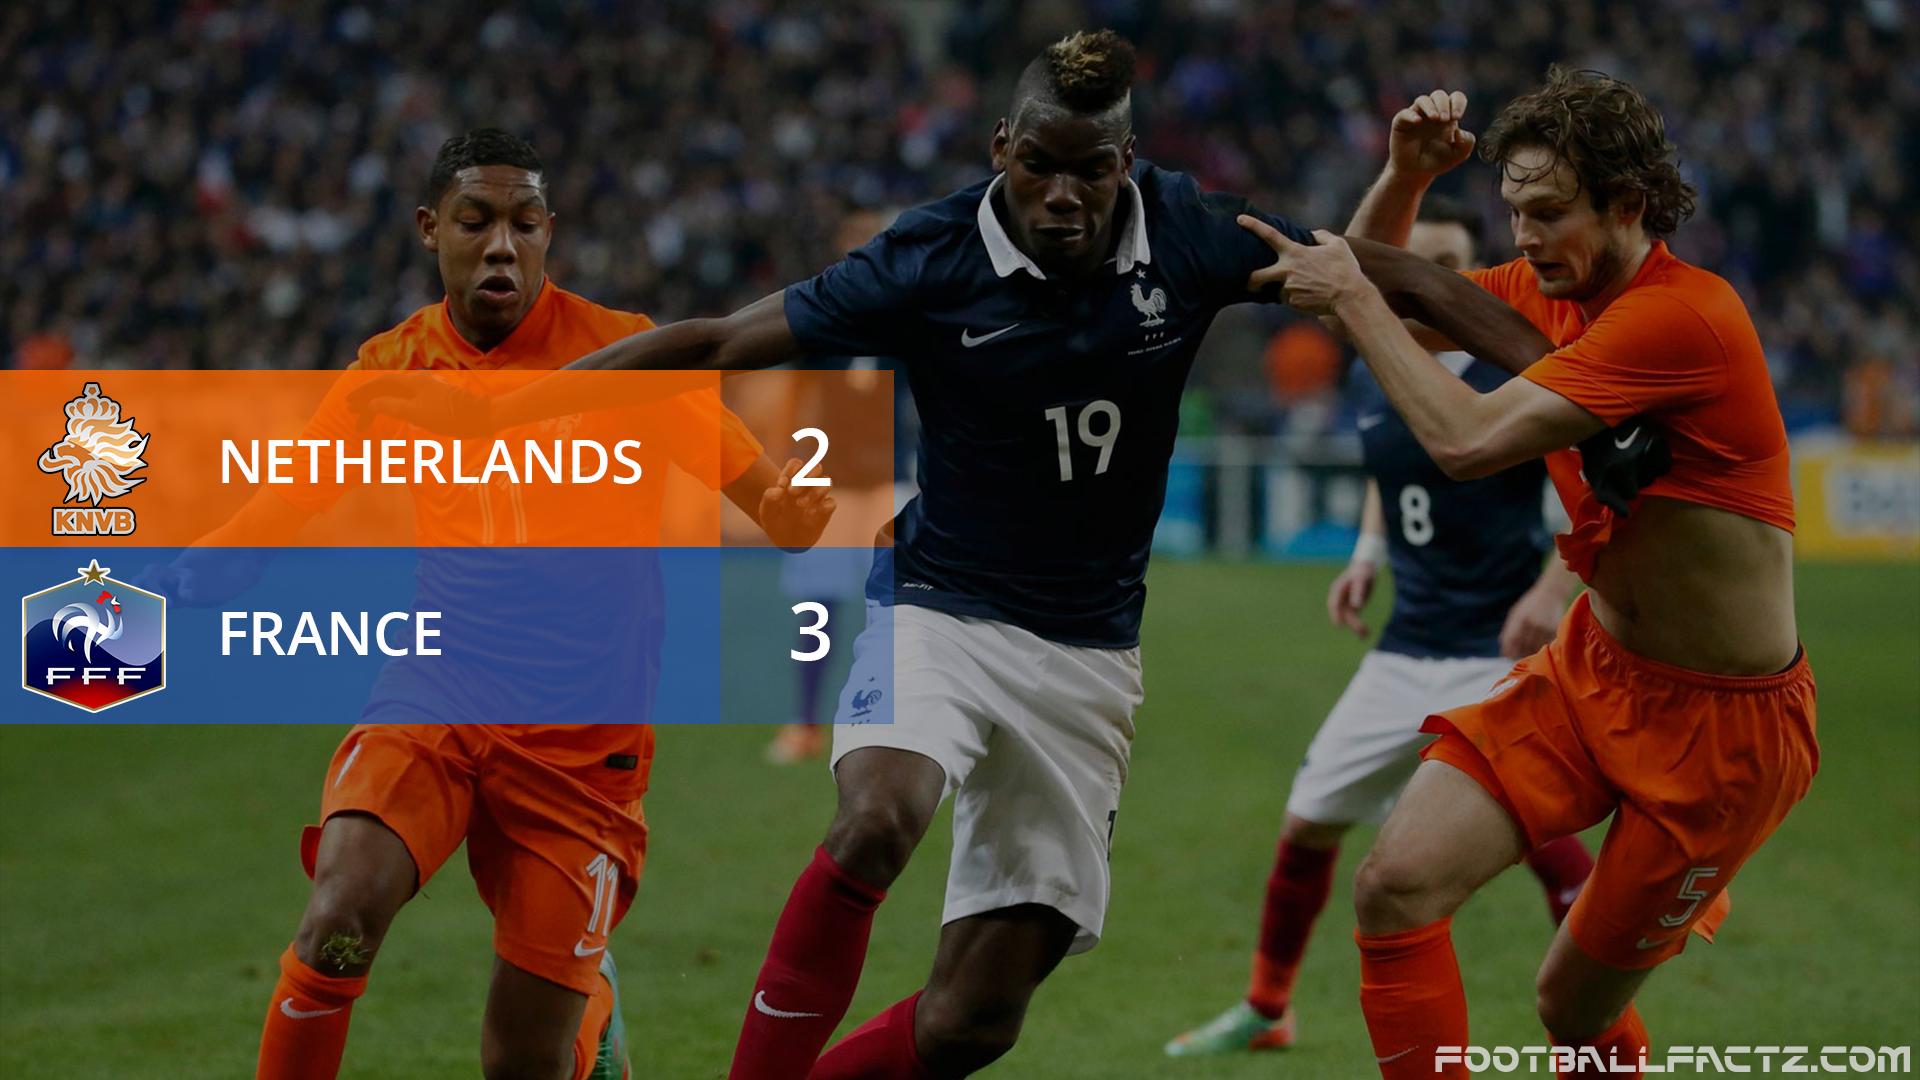 Netherlands 2 - 3 France, International Friendly